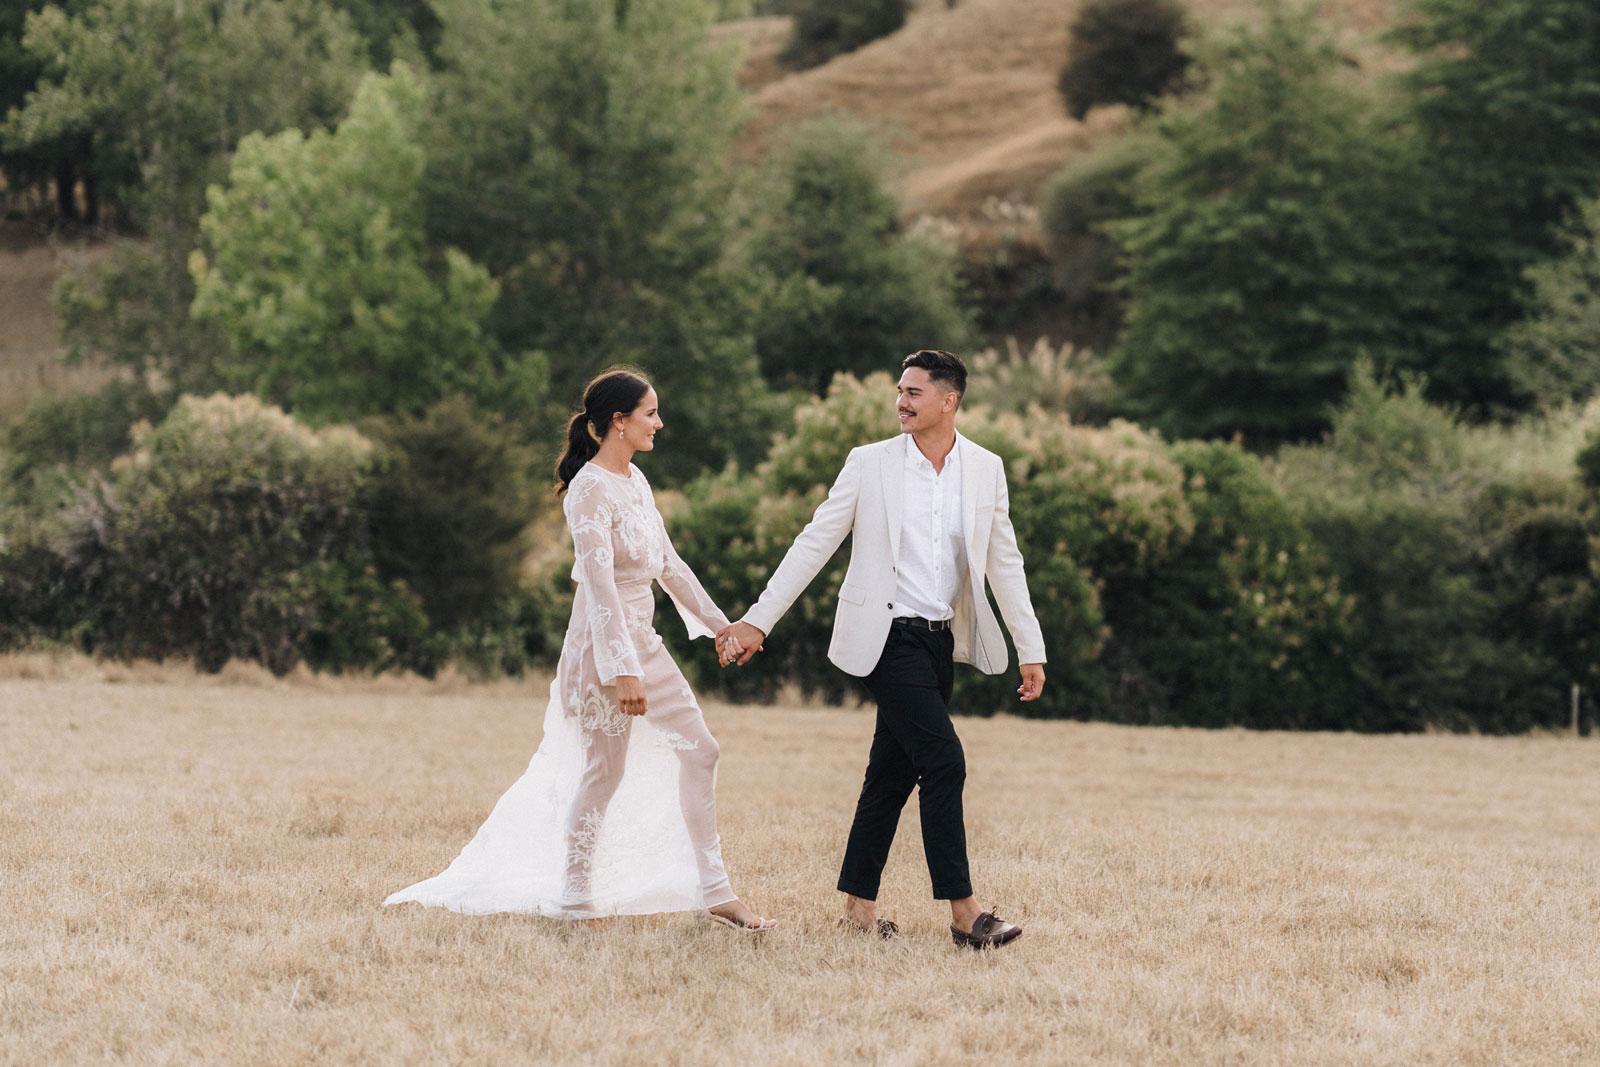 newfound-s-t-hunua-auckland-wedding-photographers-104